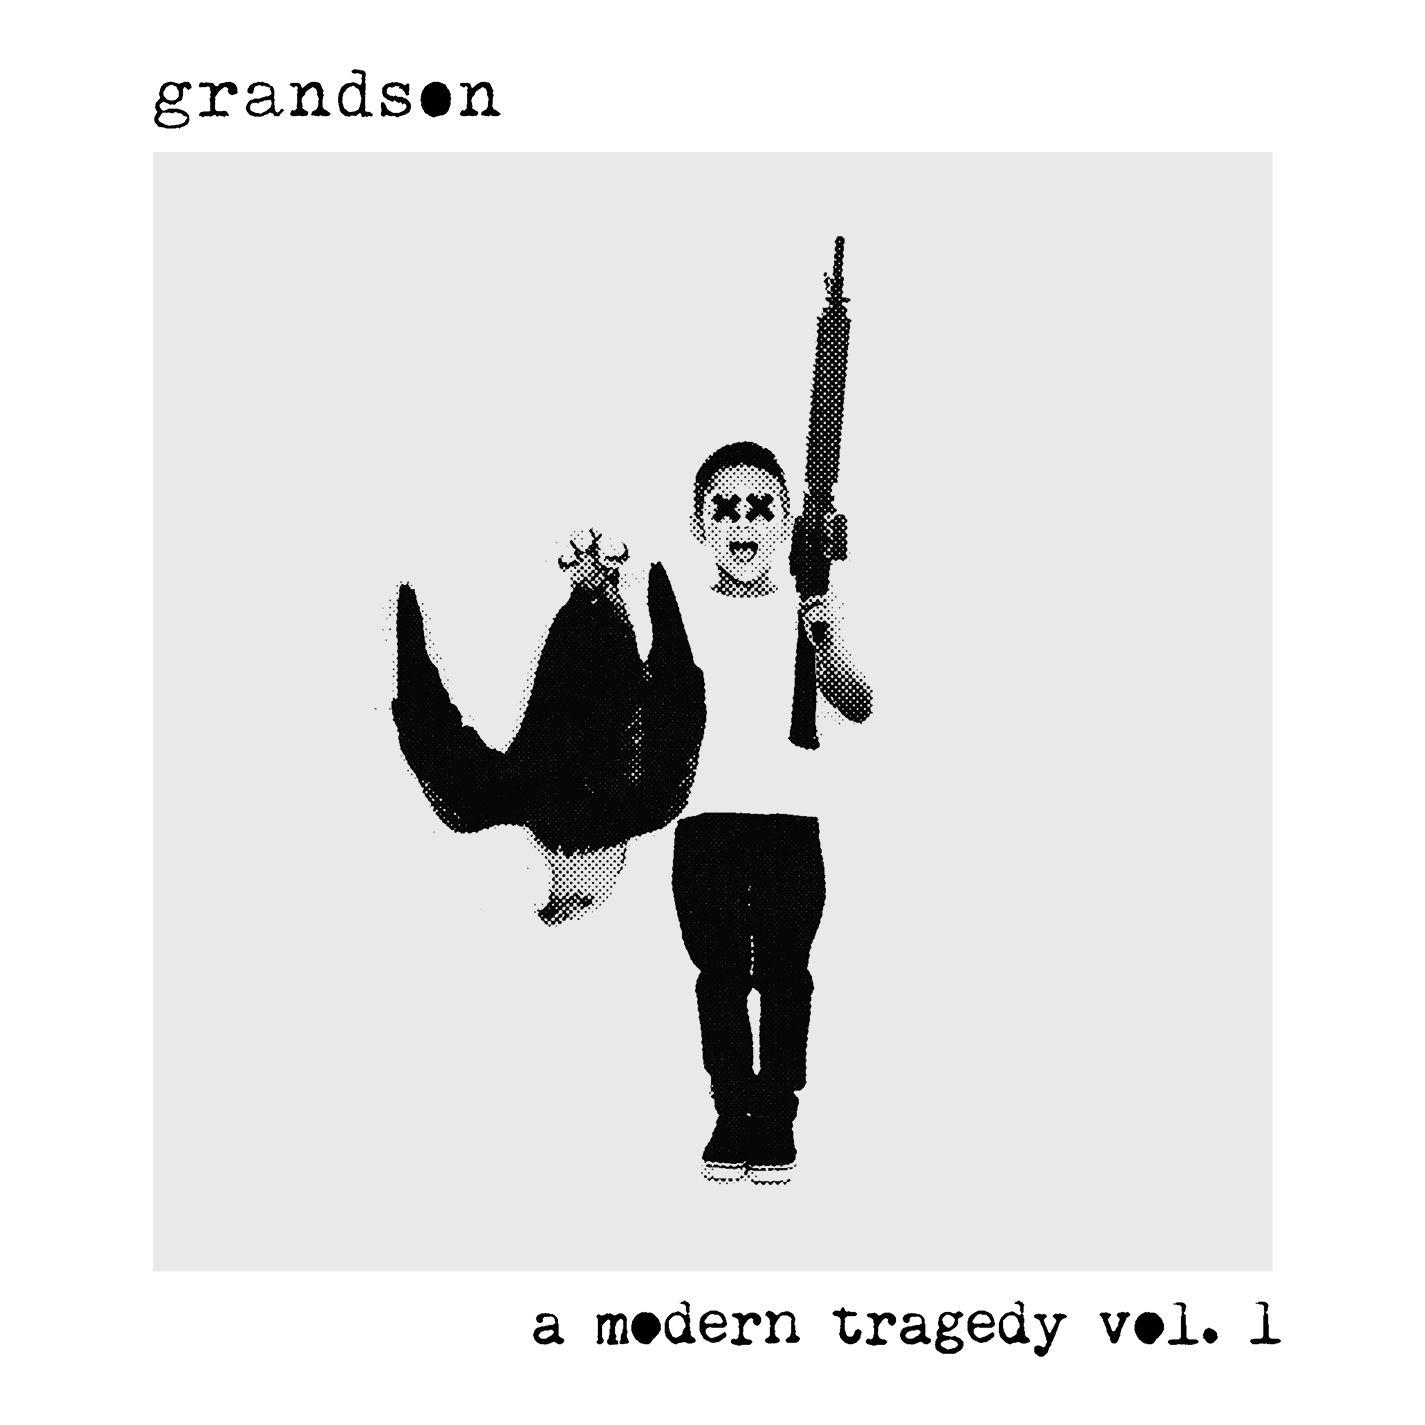 grandson 's Unique Sound Shines In   a modern tragedy, vol. 1